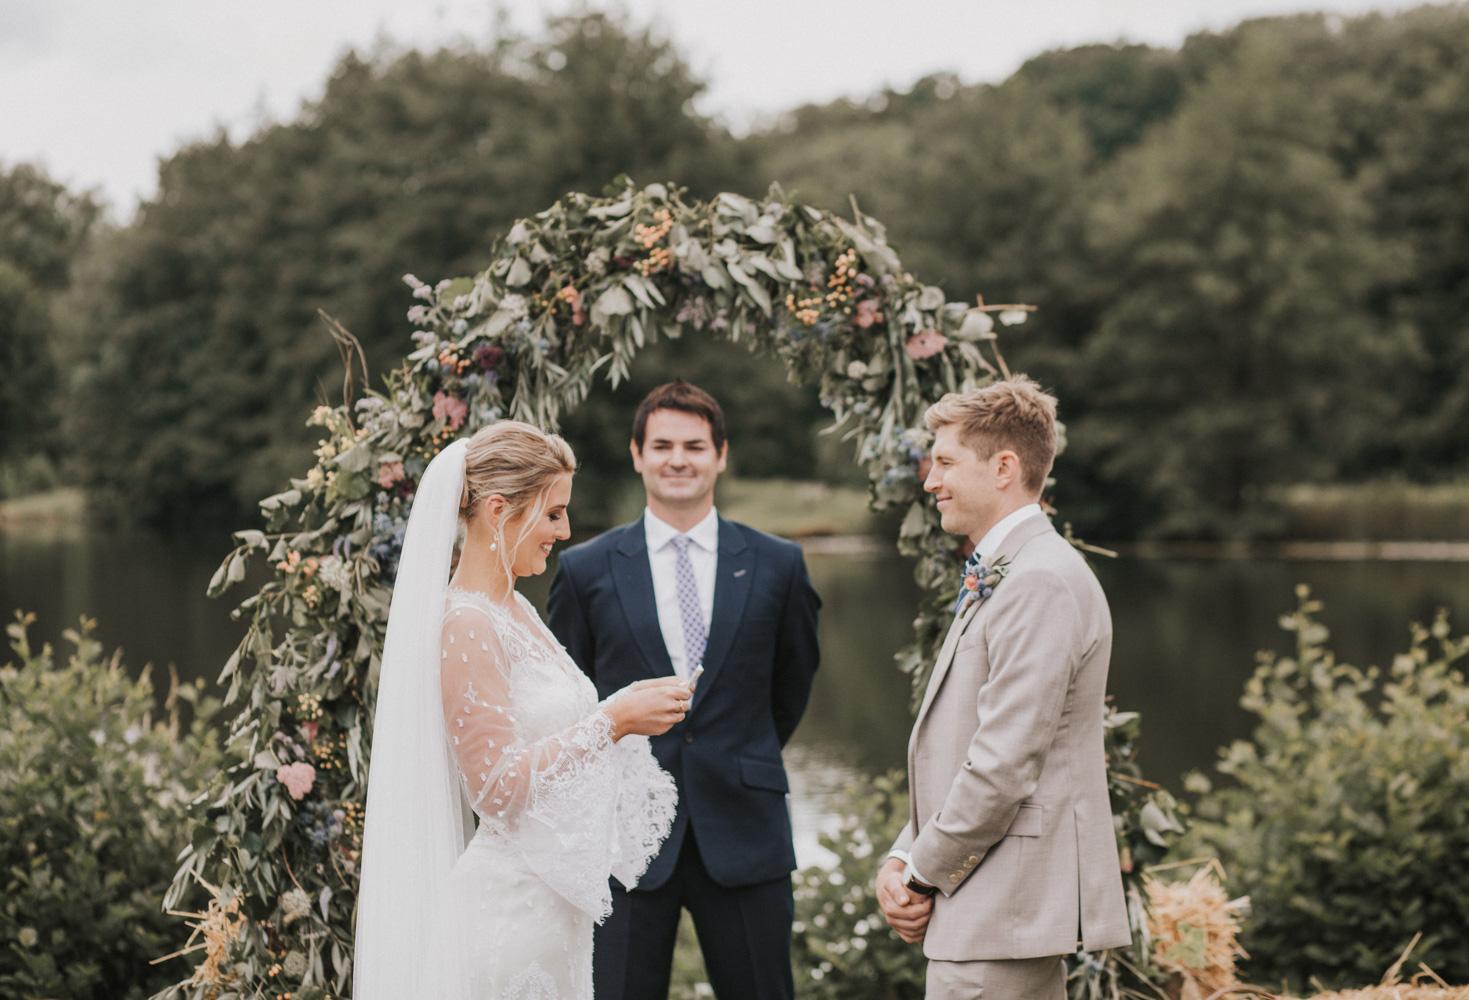 west-sussex- wedding -photographer - Duncton mill fishery4.JPG